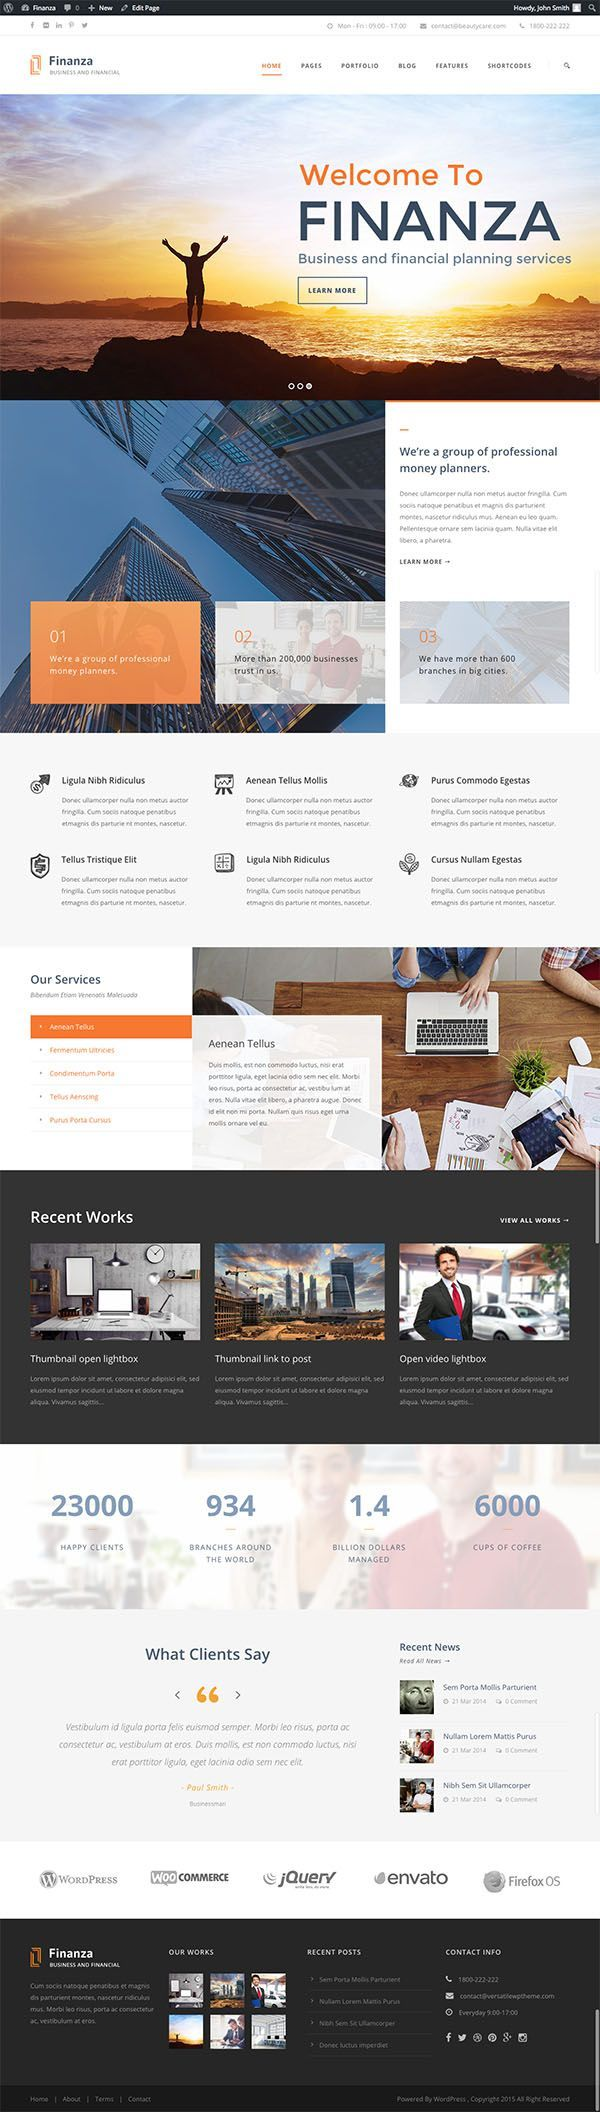 15 Fresh Responsive HTML5 WordPress Themes, http://wpgrand.com/html5-wp-themes/